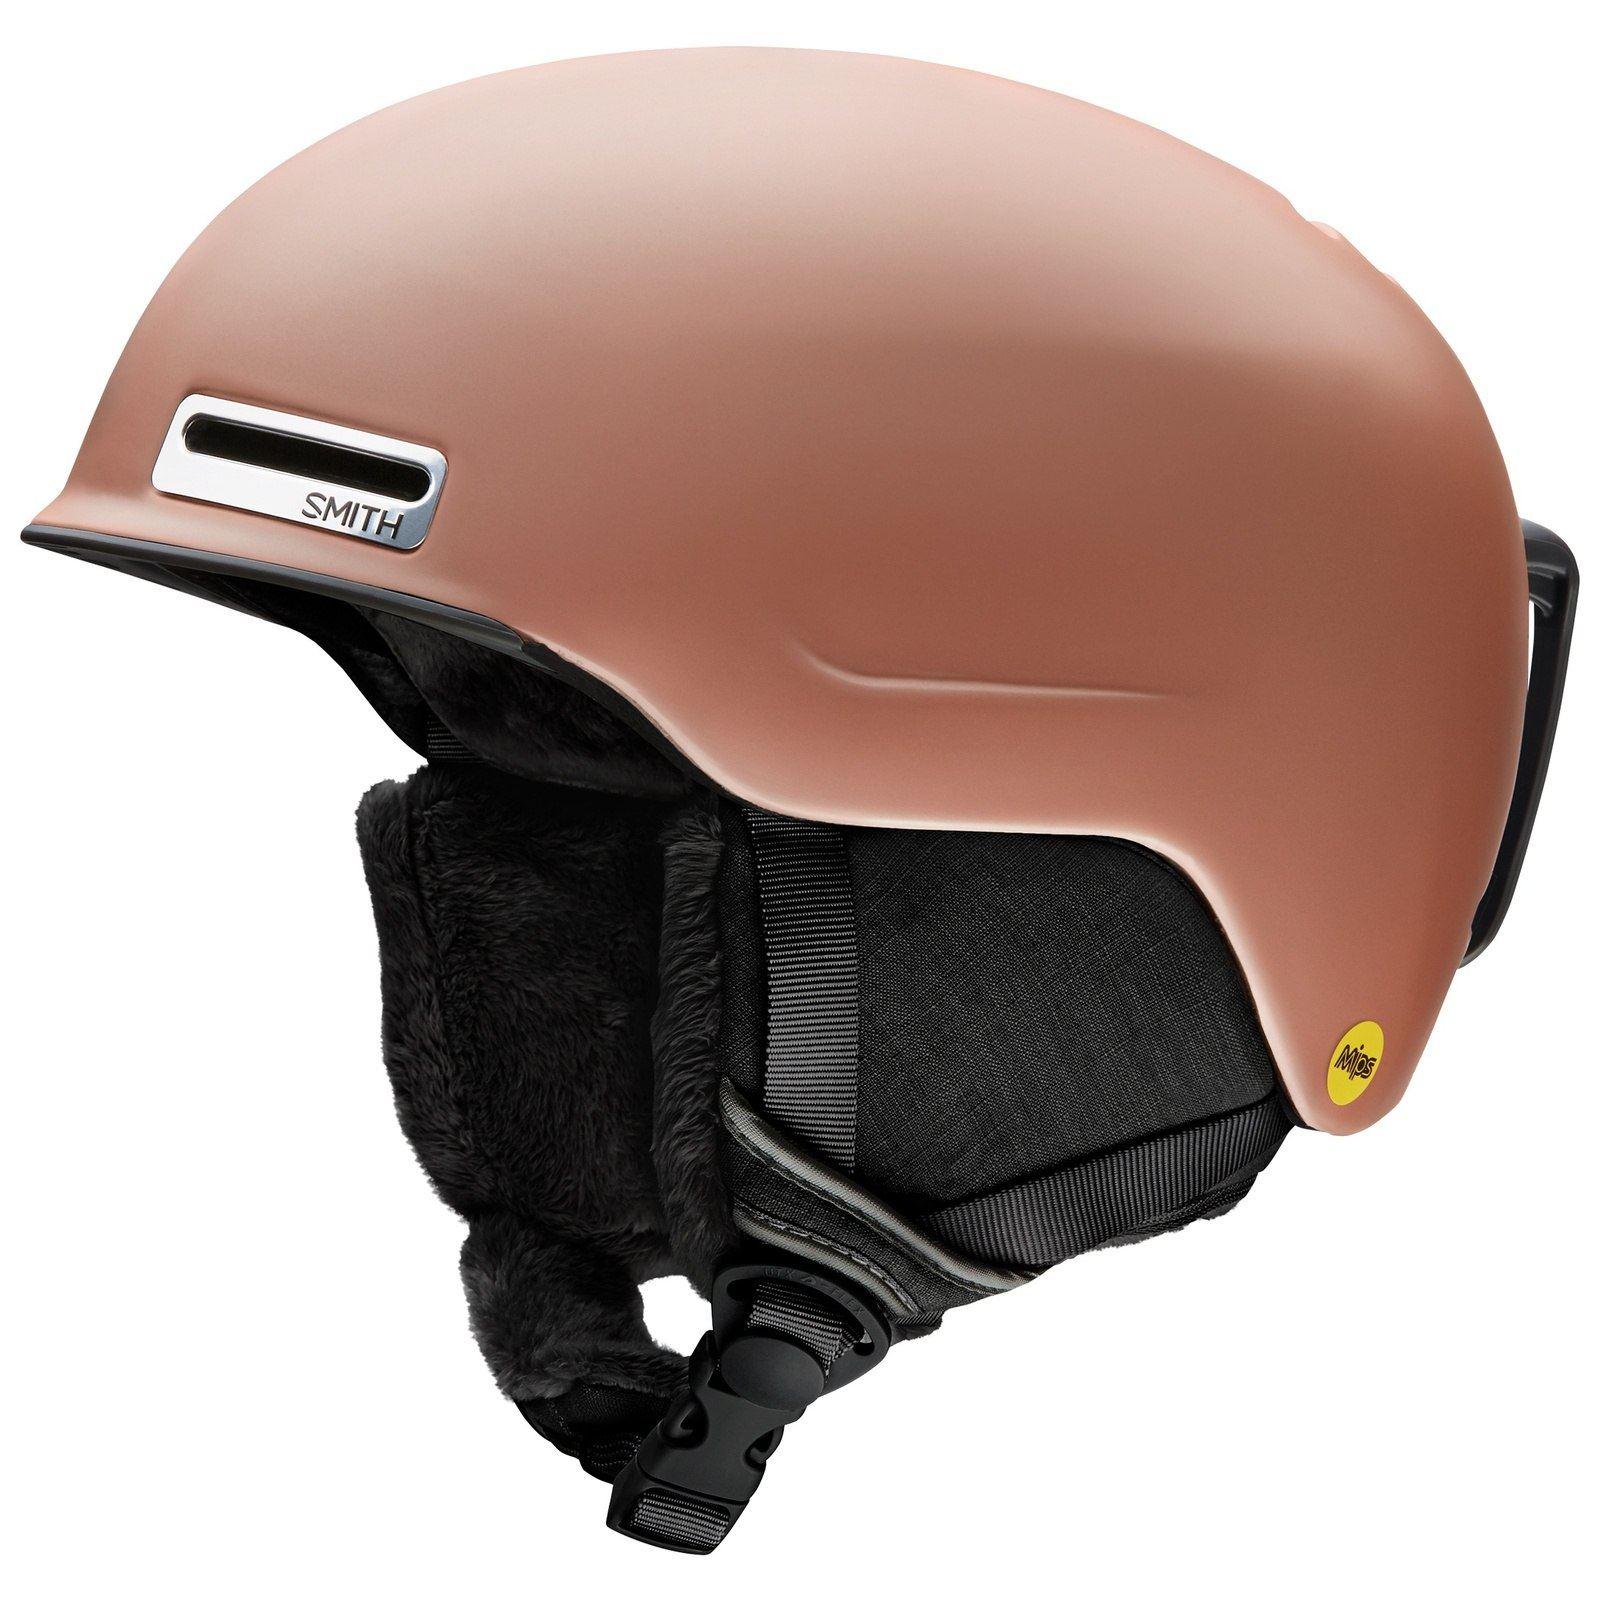 Ski Helmet Sale >> Smith Women S Allure Mips Ski Helmet On Sale Powder7 Com